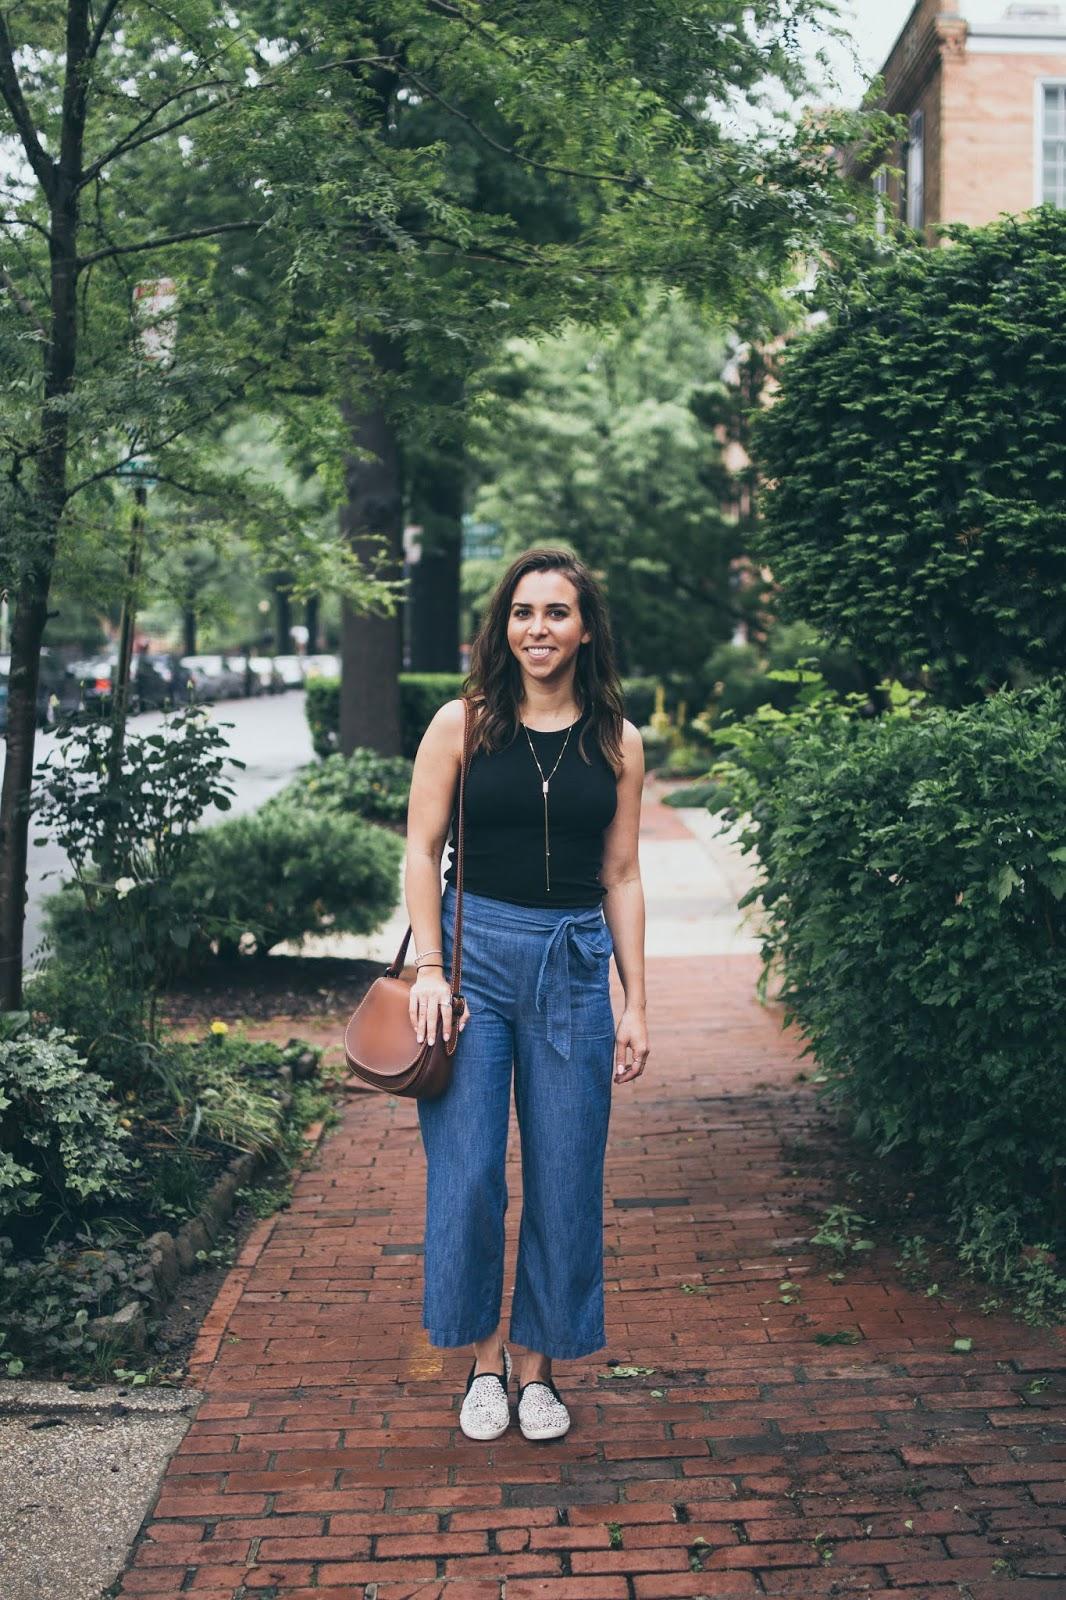 chambray-culottes-casual-style-dc-blogger-avizastyle-andrea-viza